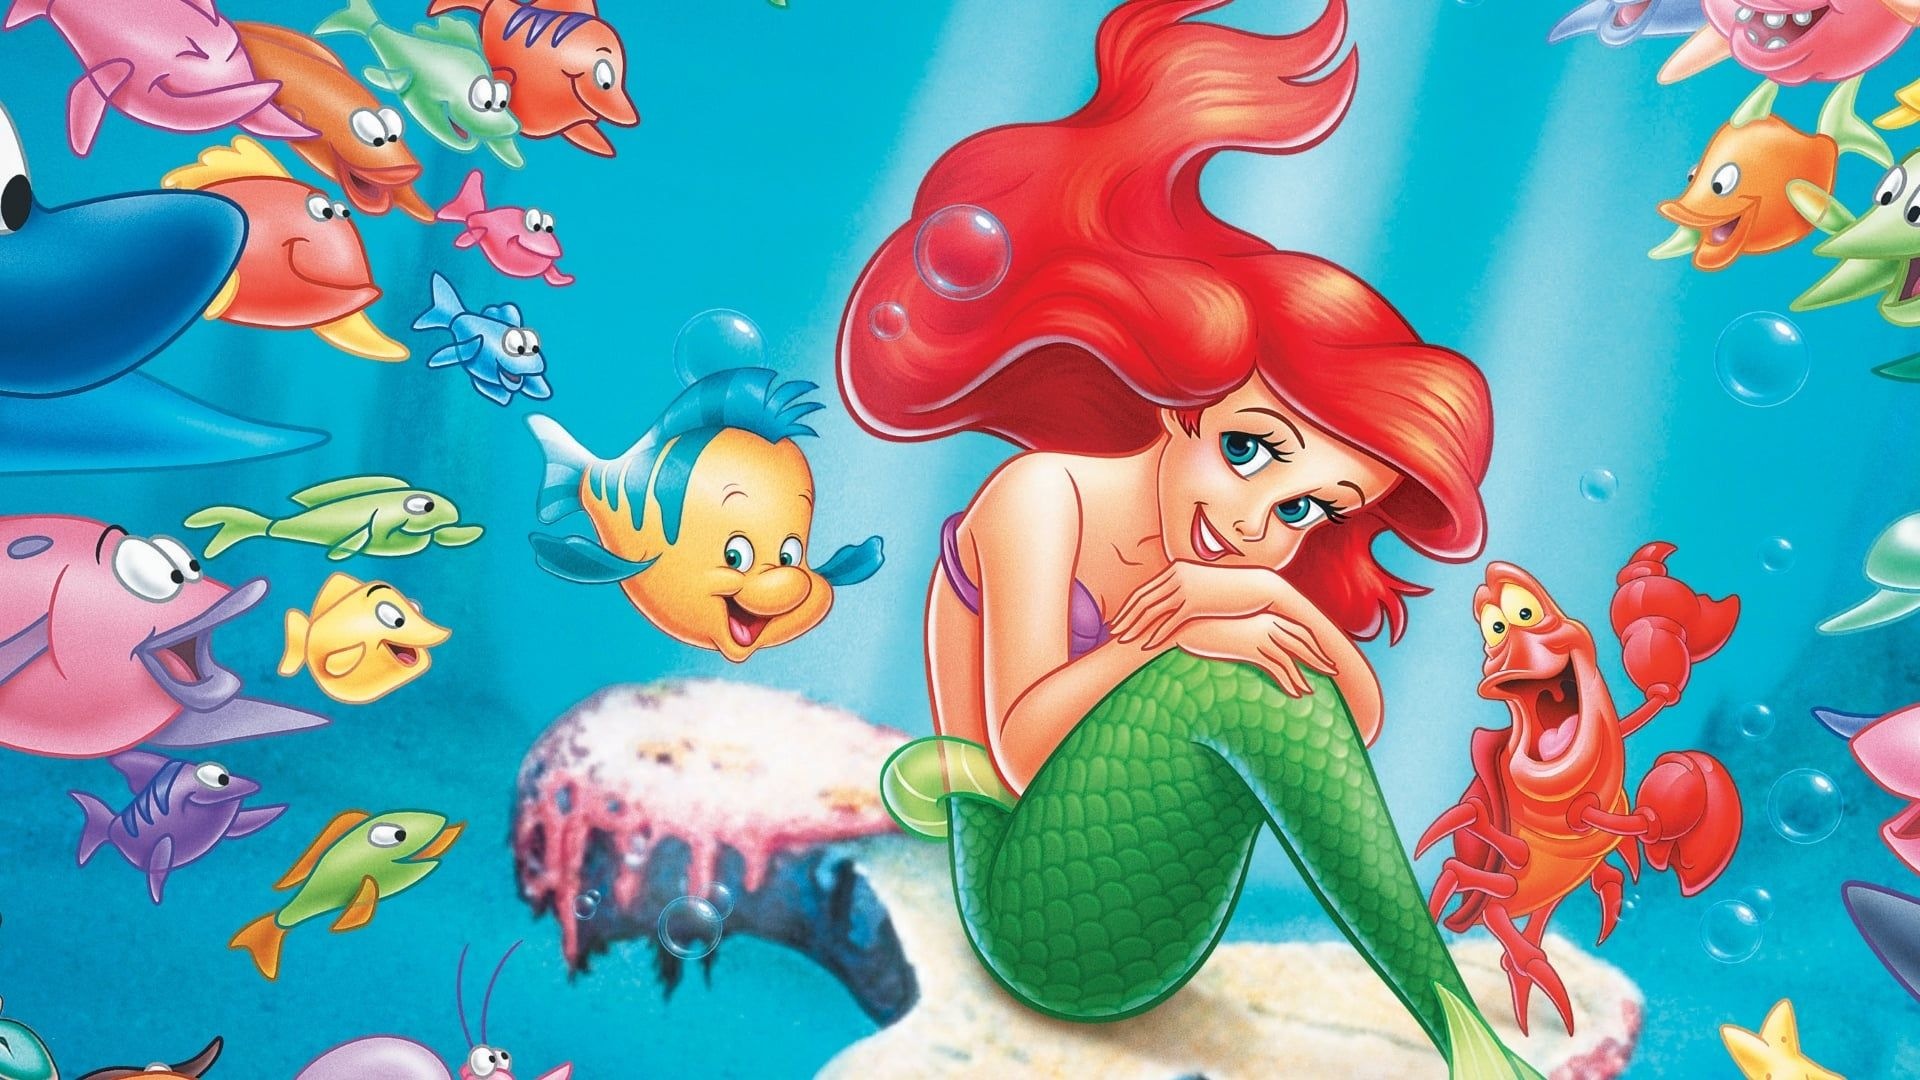 Watch The Little Mermaid 1989 Online Free Full Movie The Little Mermaid Walt Disney Pictures Free Movies Online